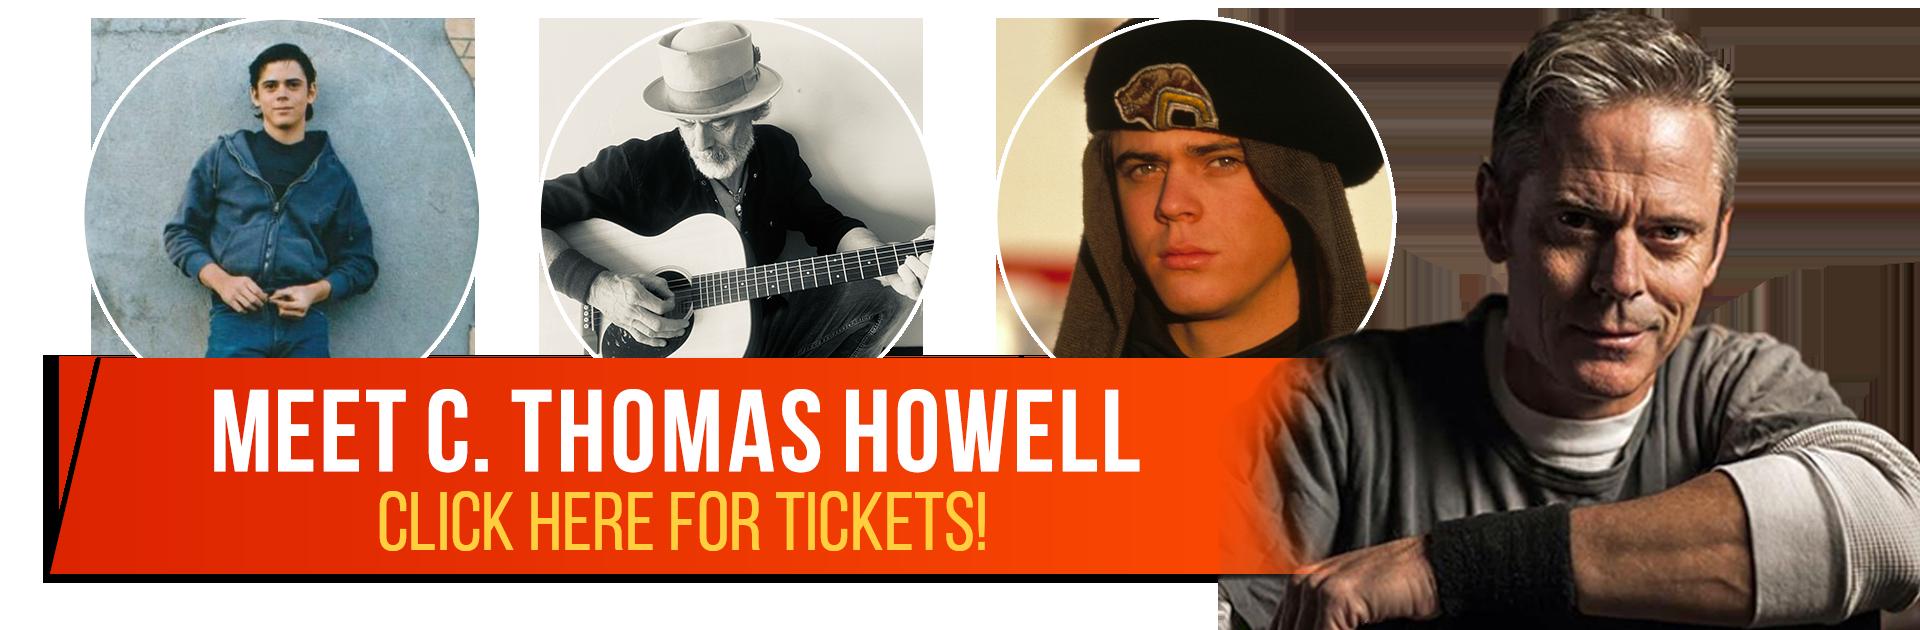 Click to Meet C Thomas Howell!